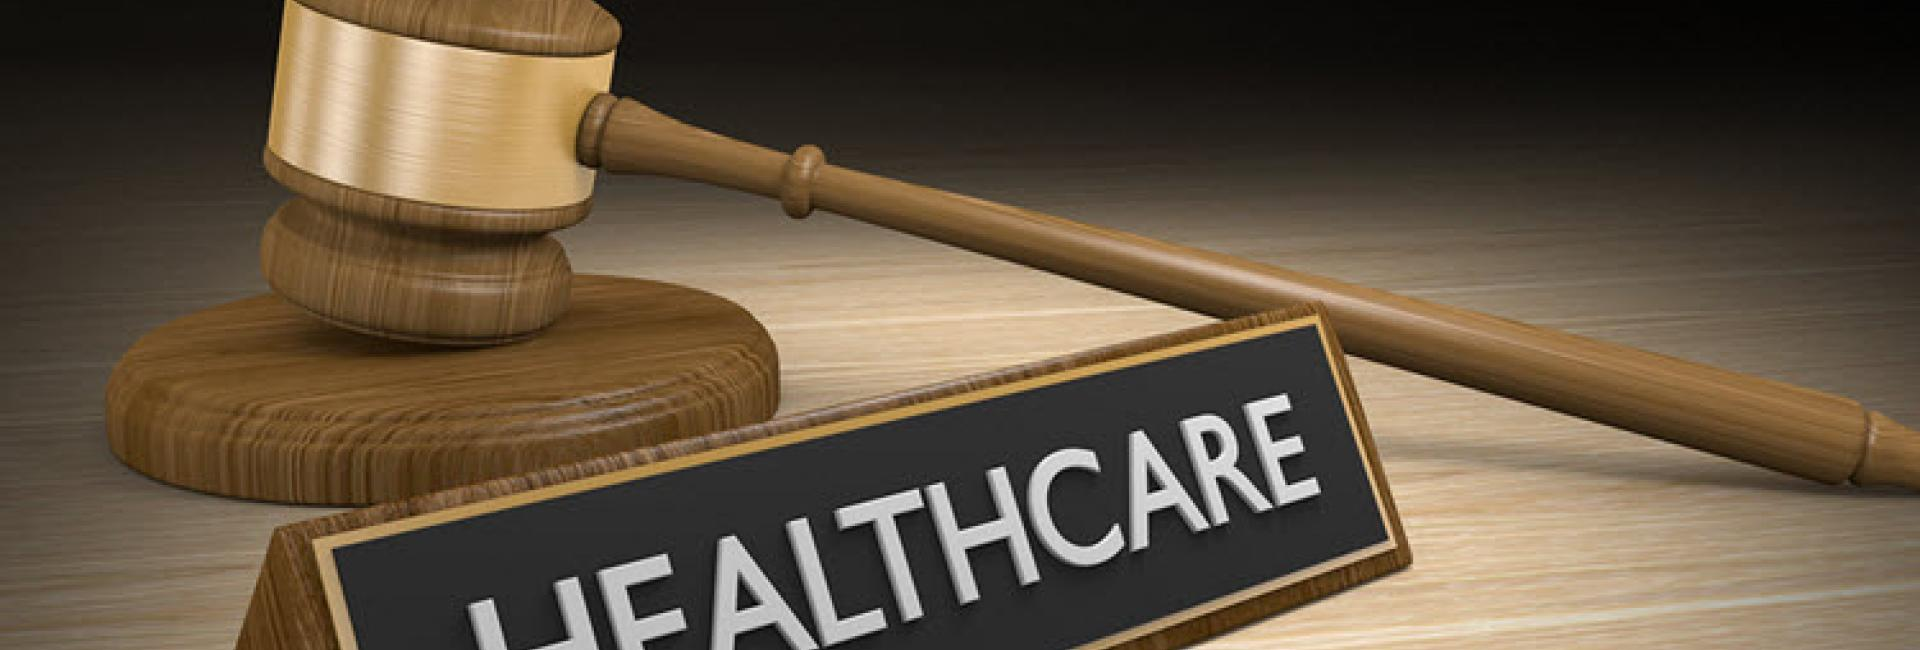 Medicare & Medicaid Law